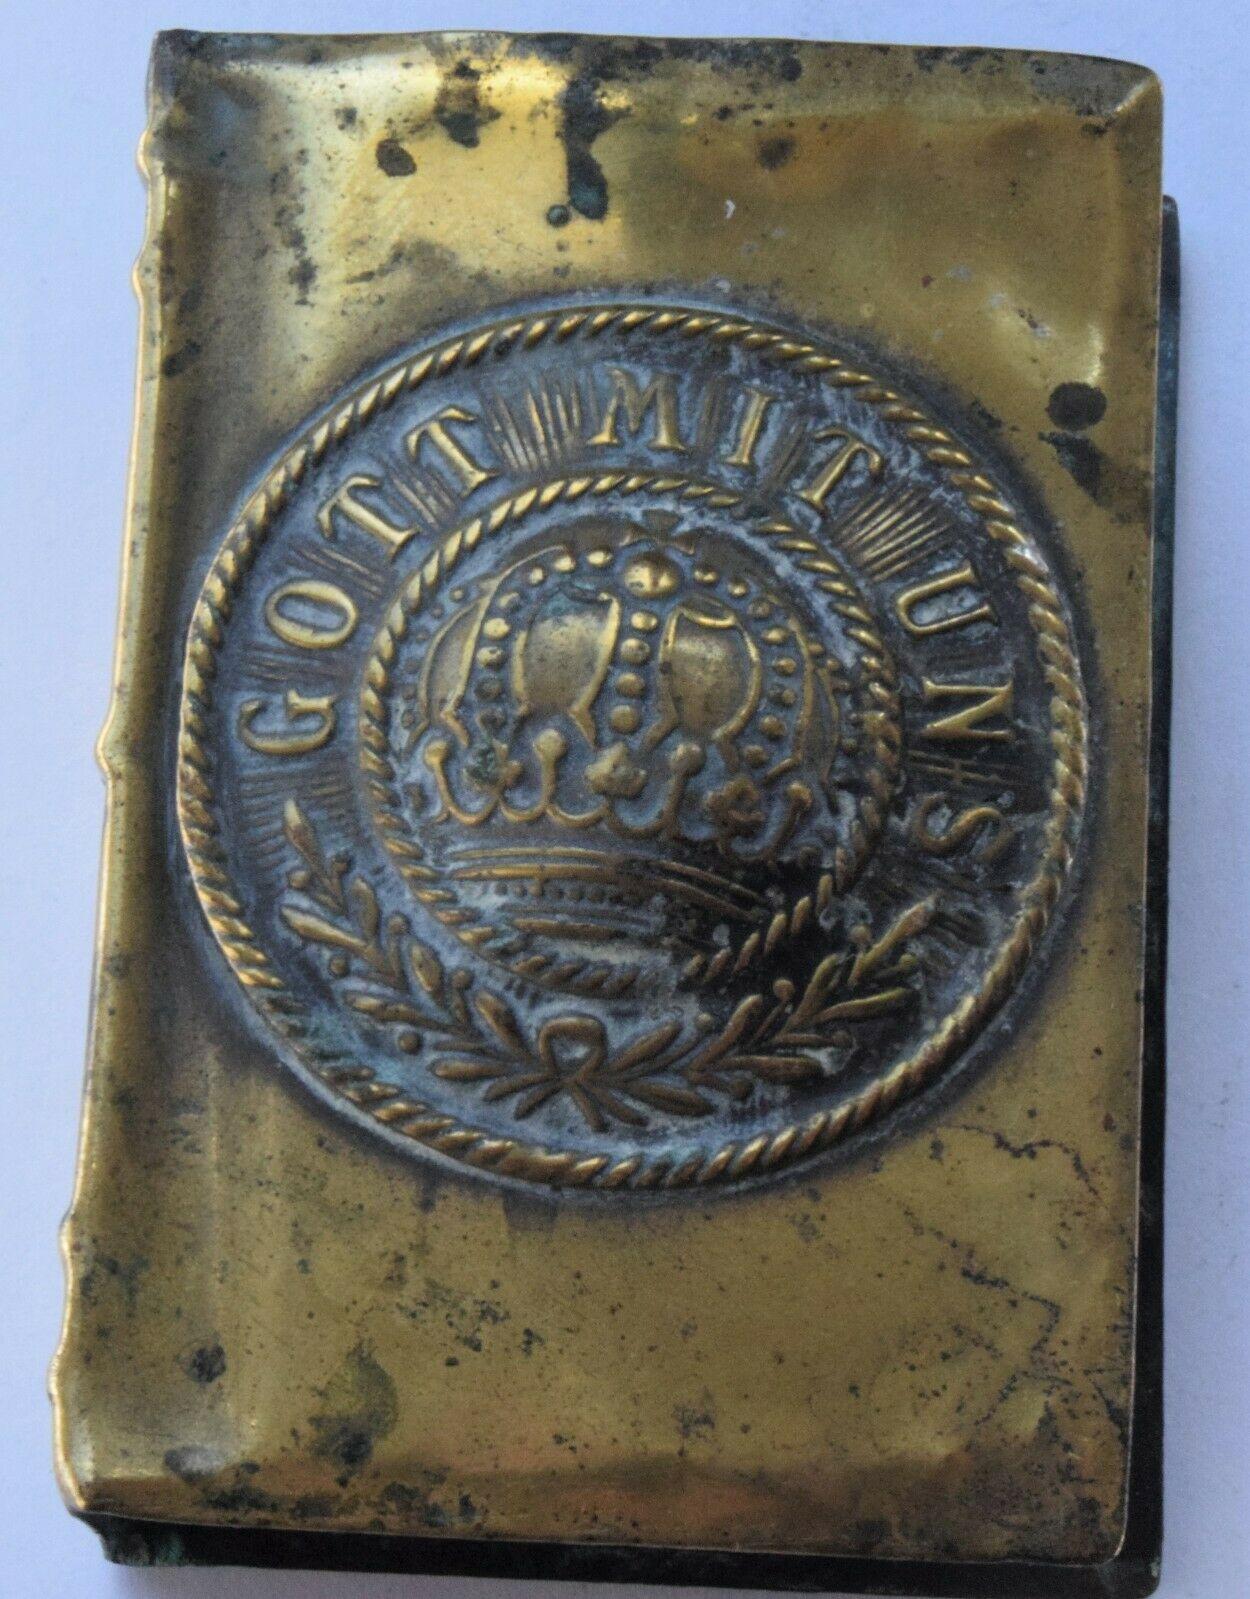 Rare Wwi Trench Art Brass Match Box Holder Germany Gott Mit Uns 007 La220559 Loveantiques Com